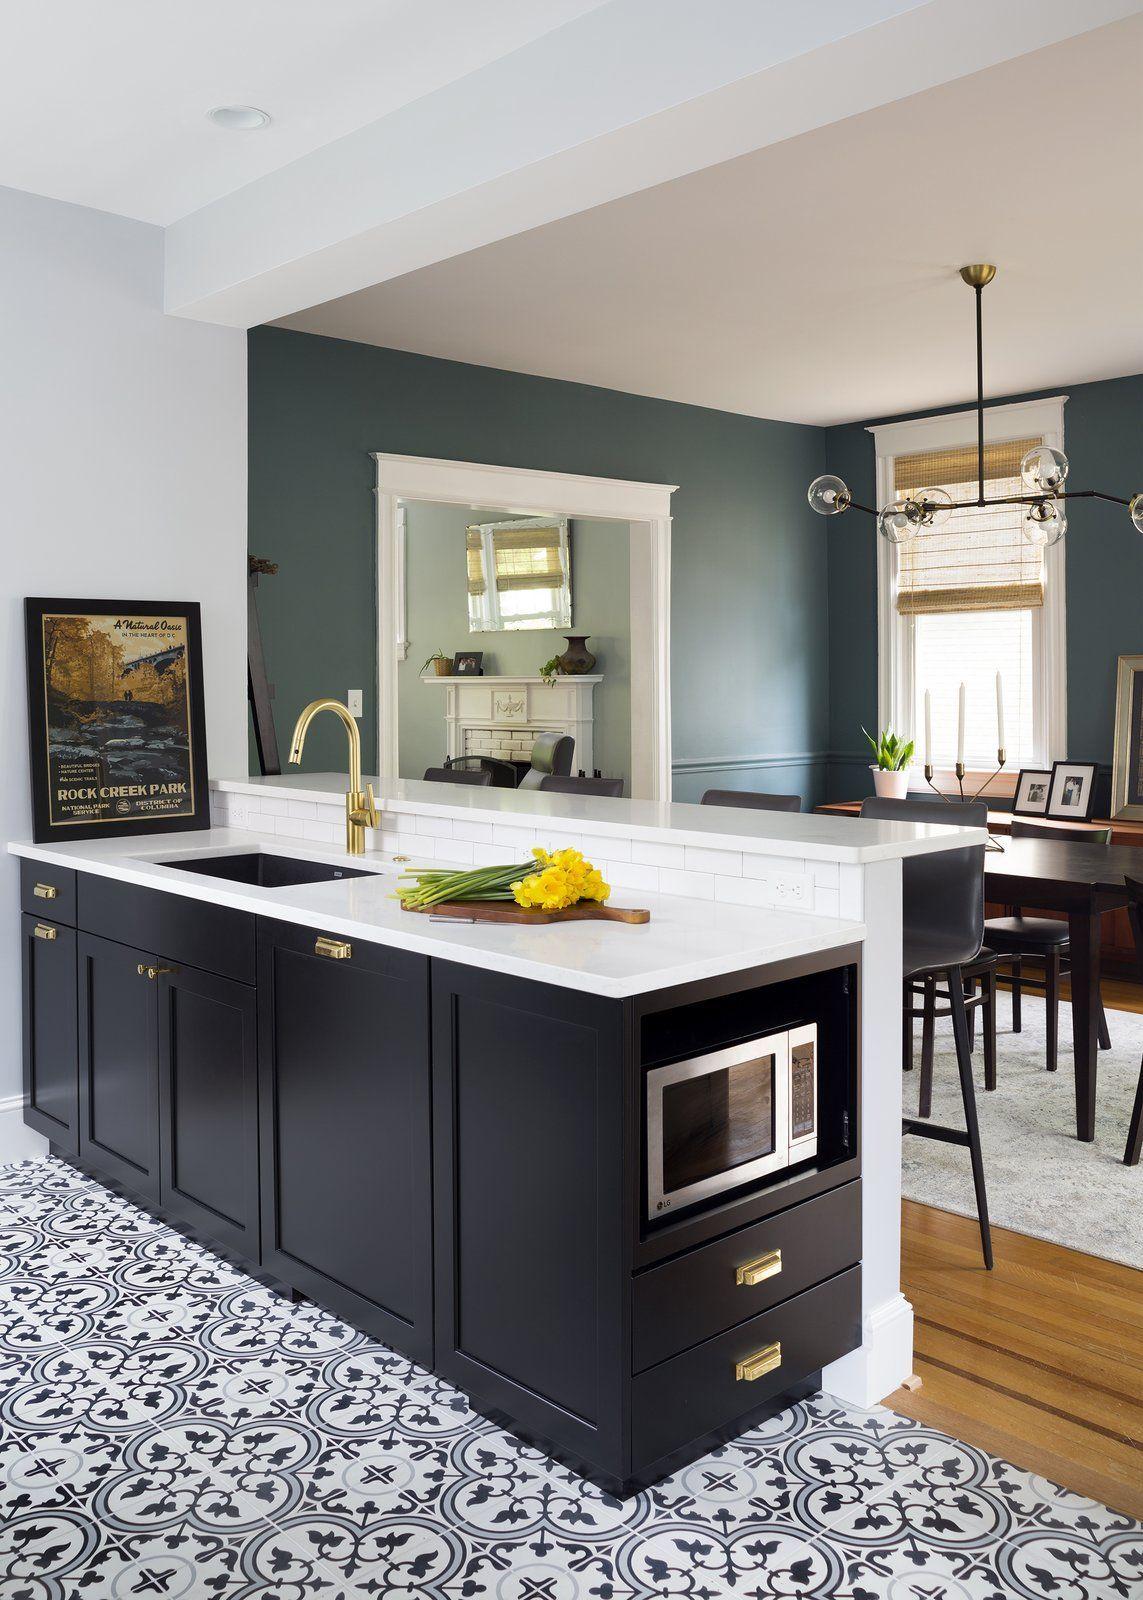 42 Beautiful Kitchen Floor Tile Ideas Kitchen Flooring Kitchen Renovation Country Kitchen Designs